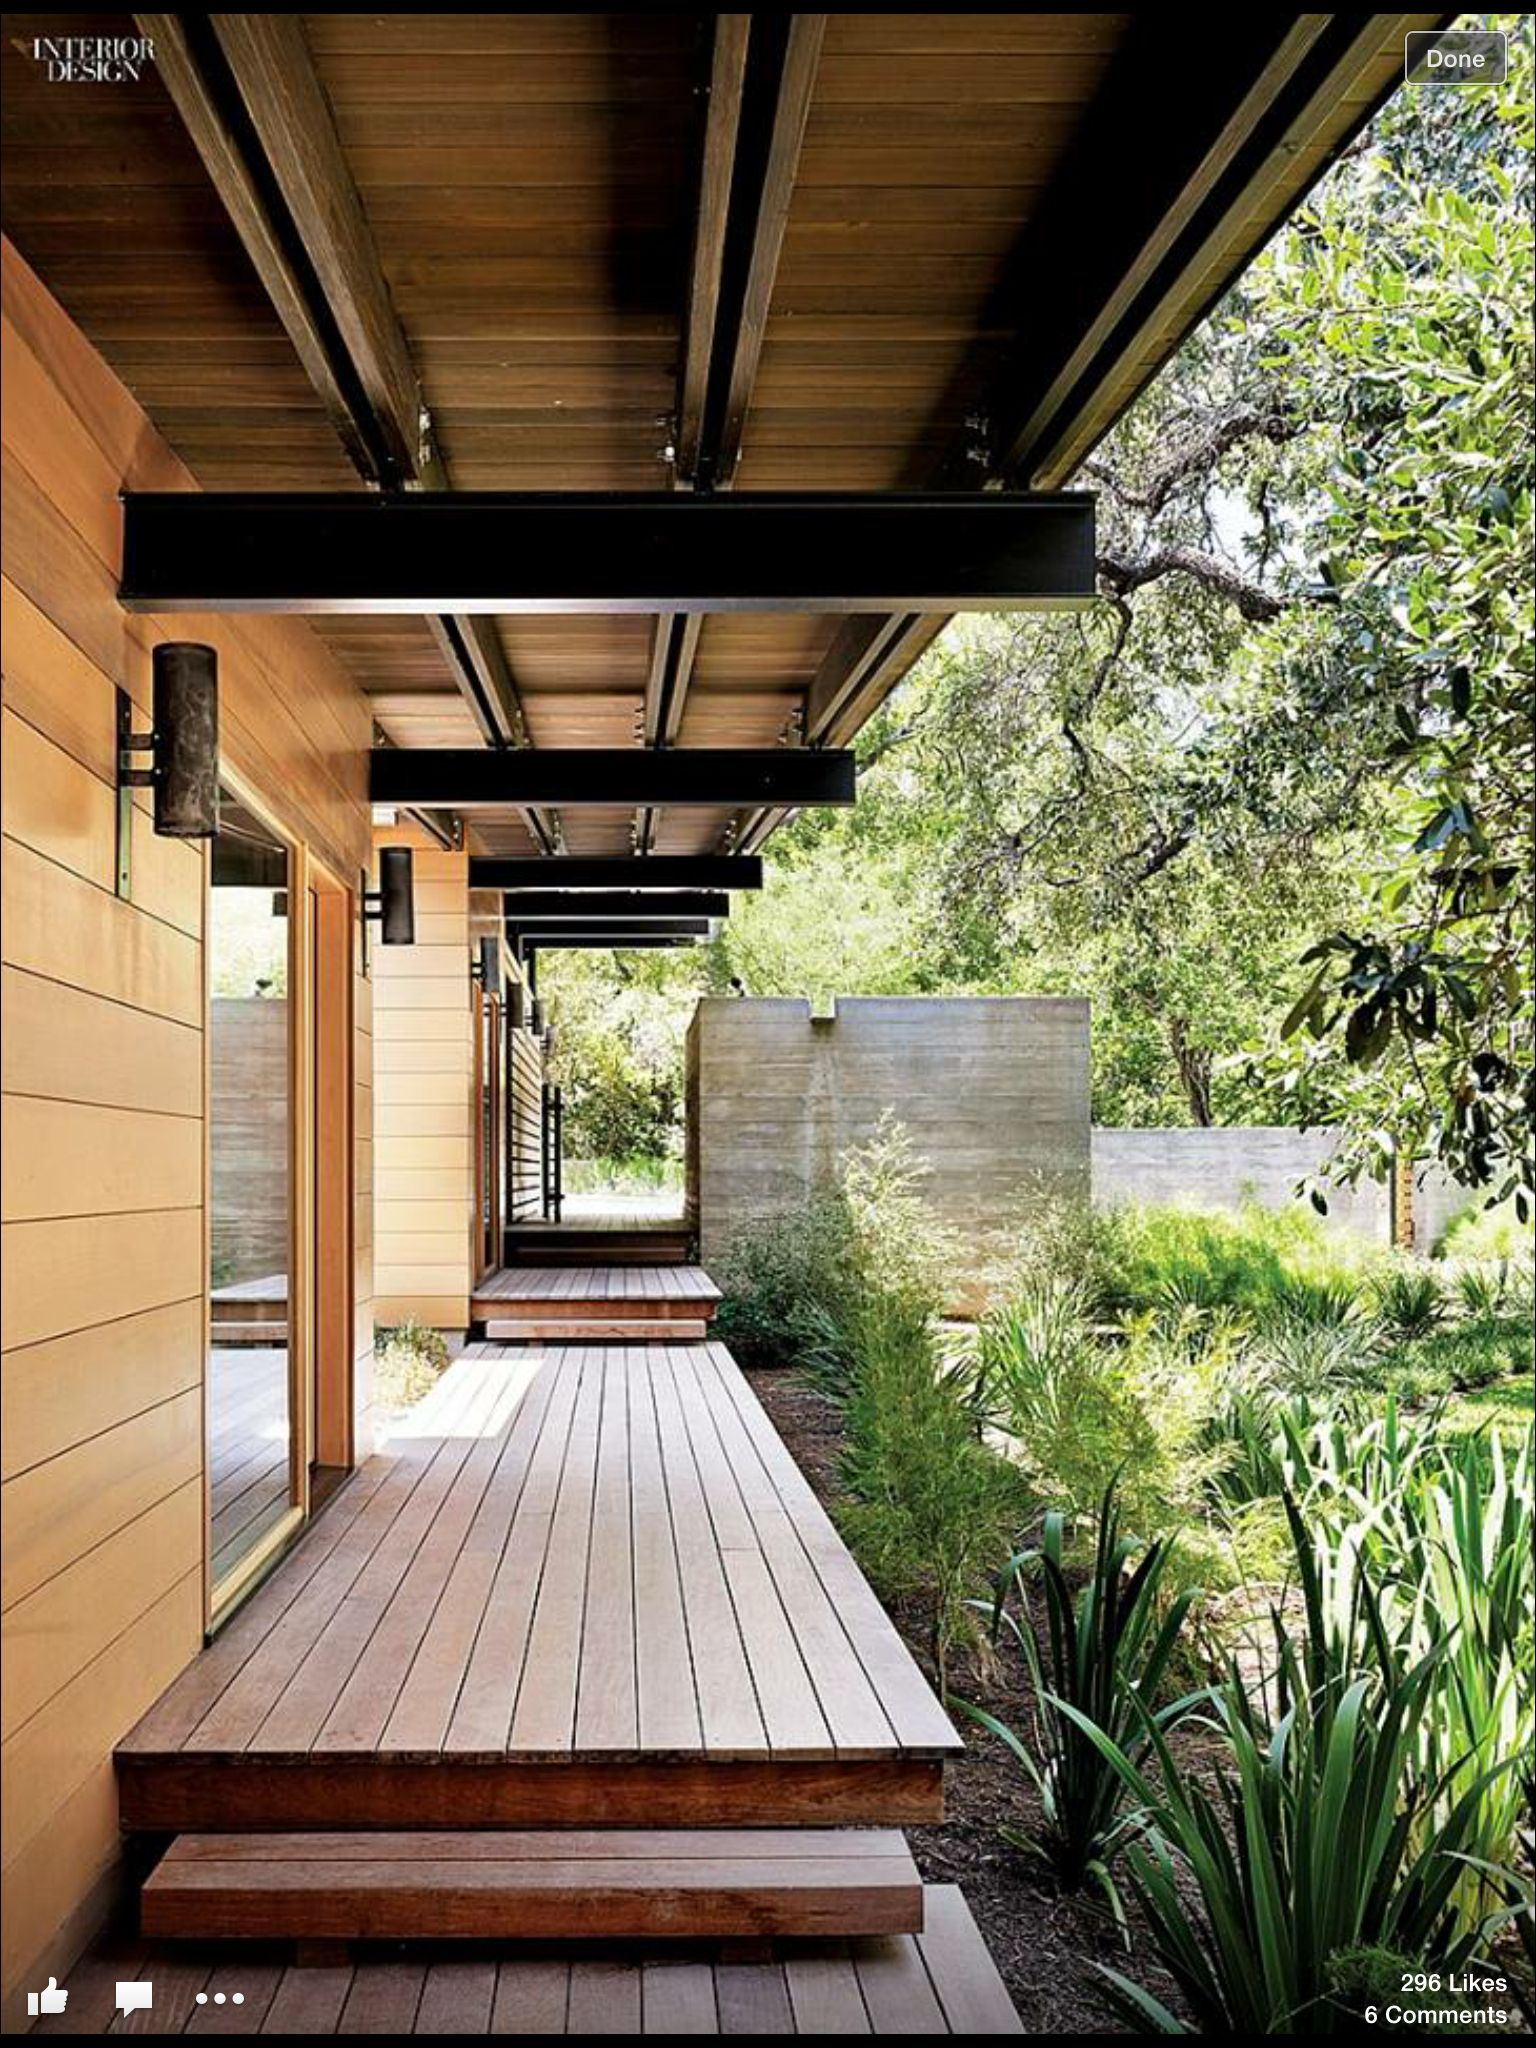 Pin by Amanda Rourke on Yard inspiration | Pinterest | Architecture ...